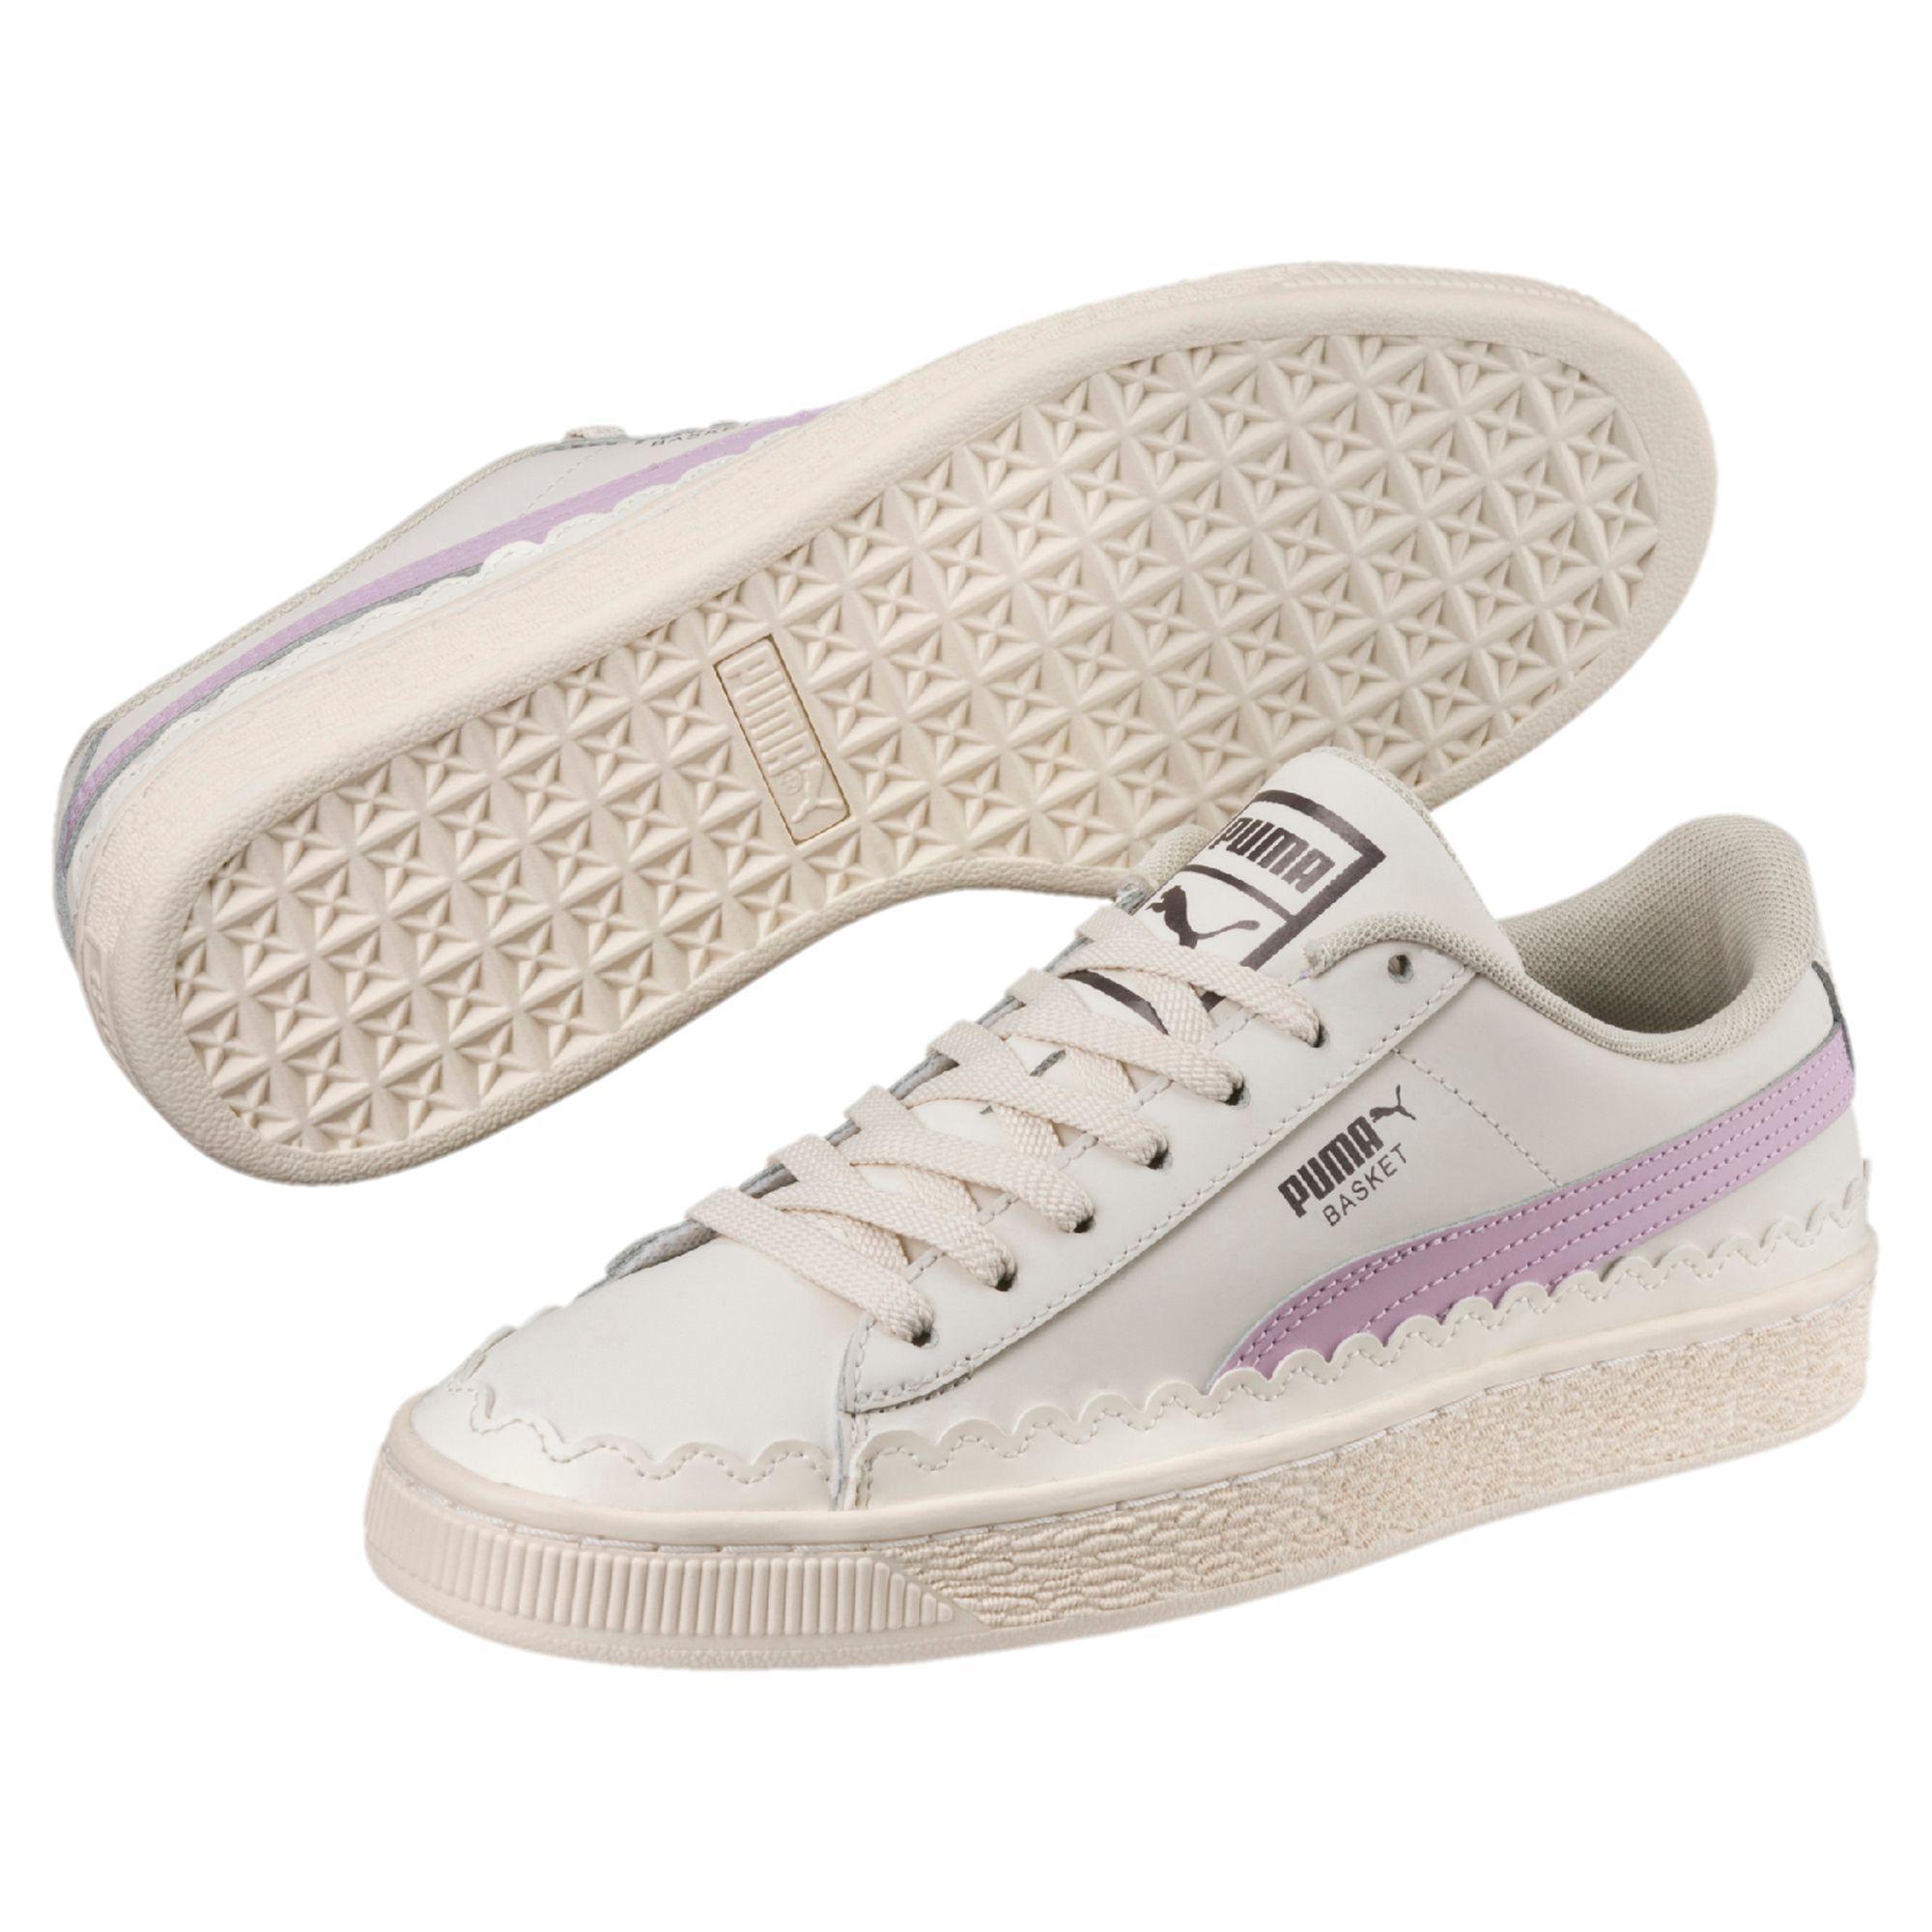 e0afb7b03a PUMA White Basket Scallop Women's Sneakers